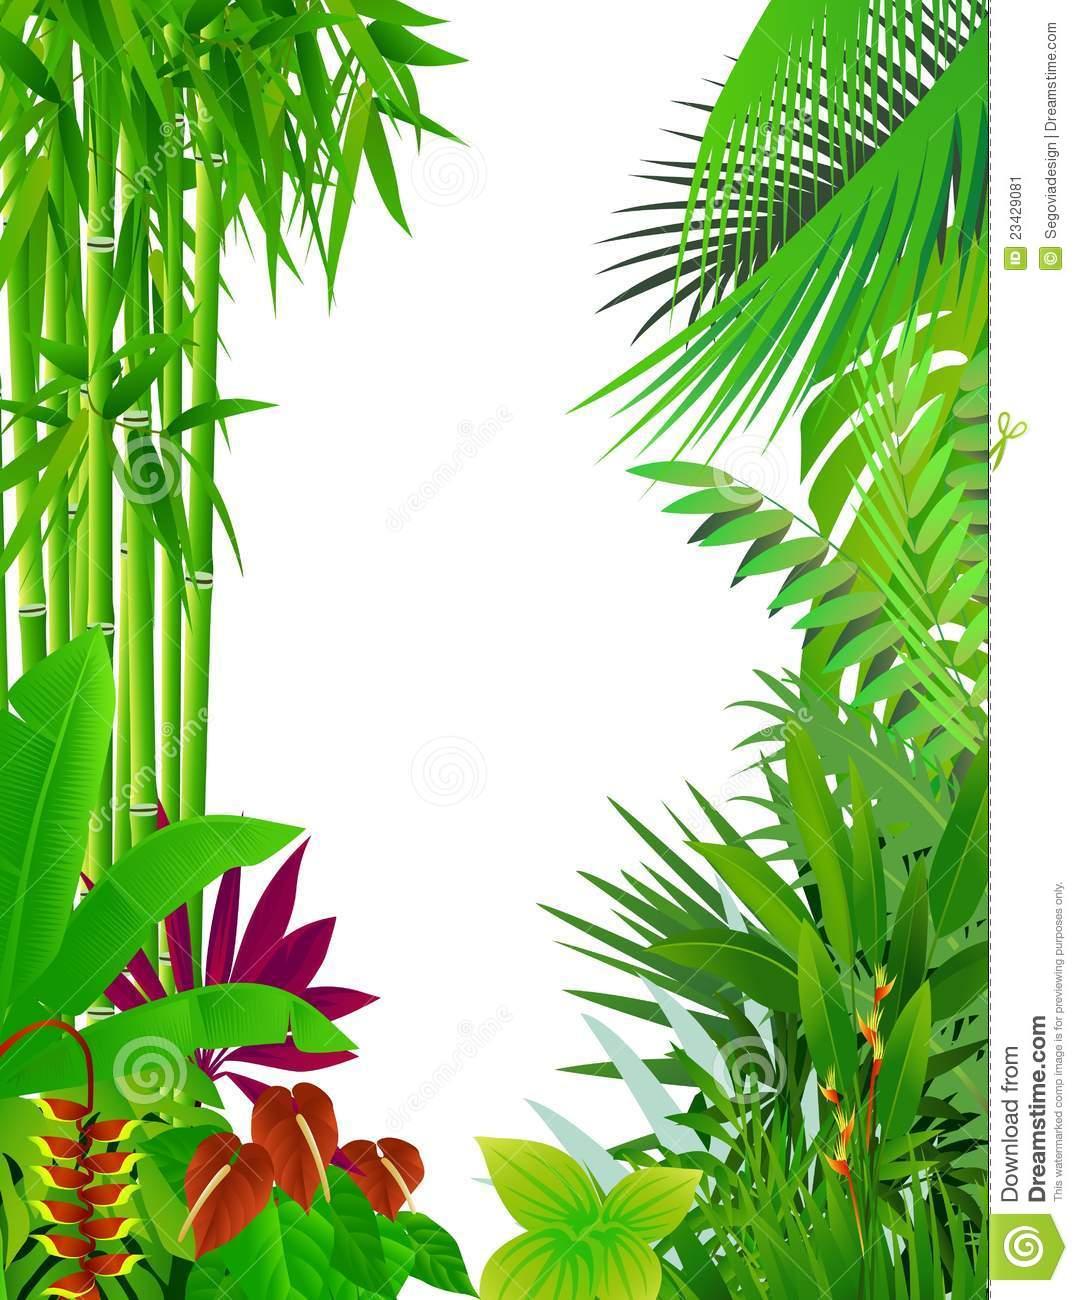 free jungle animal clipart at getdrawings com free for personal rh getdrawings com free jungle clipart download jungle animal clipart free